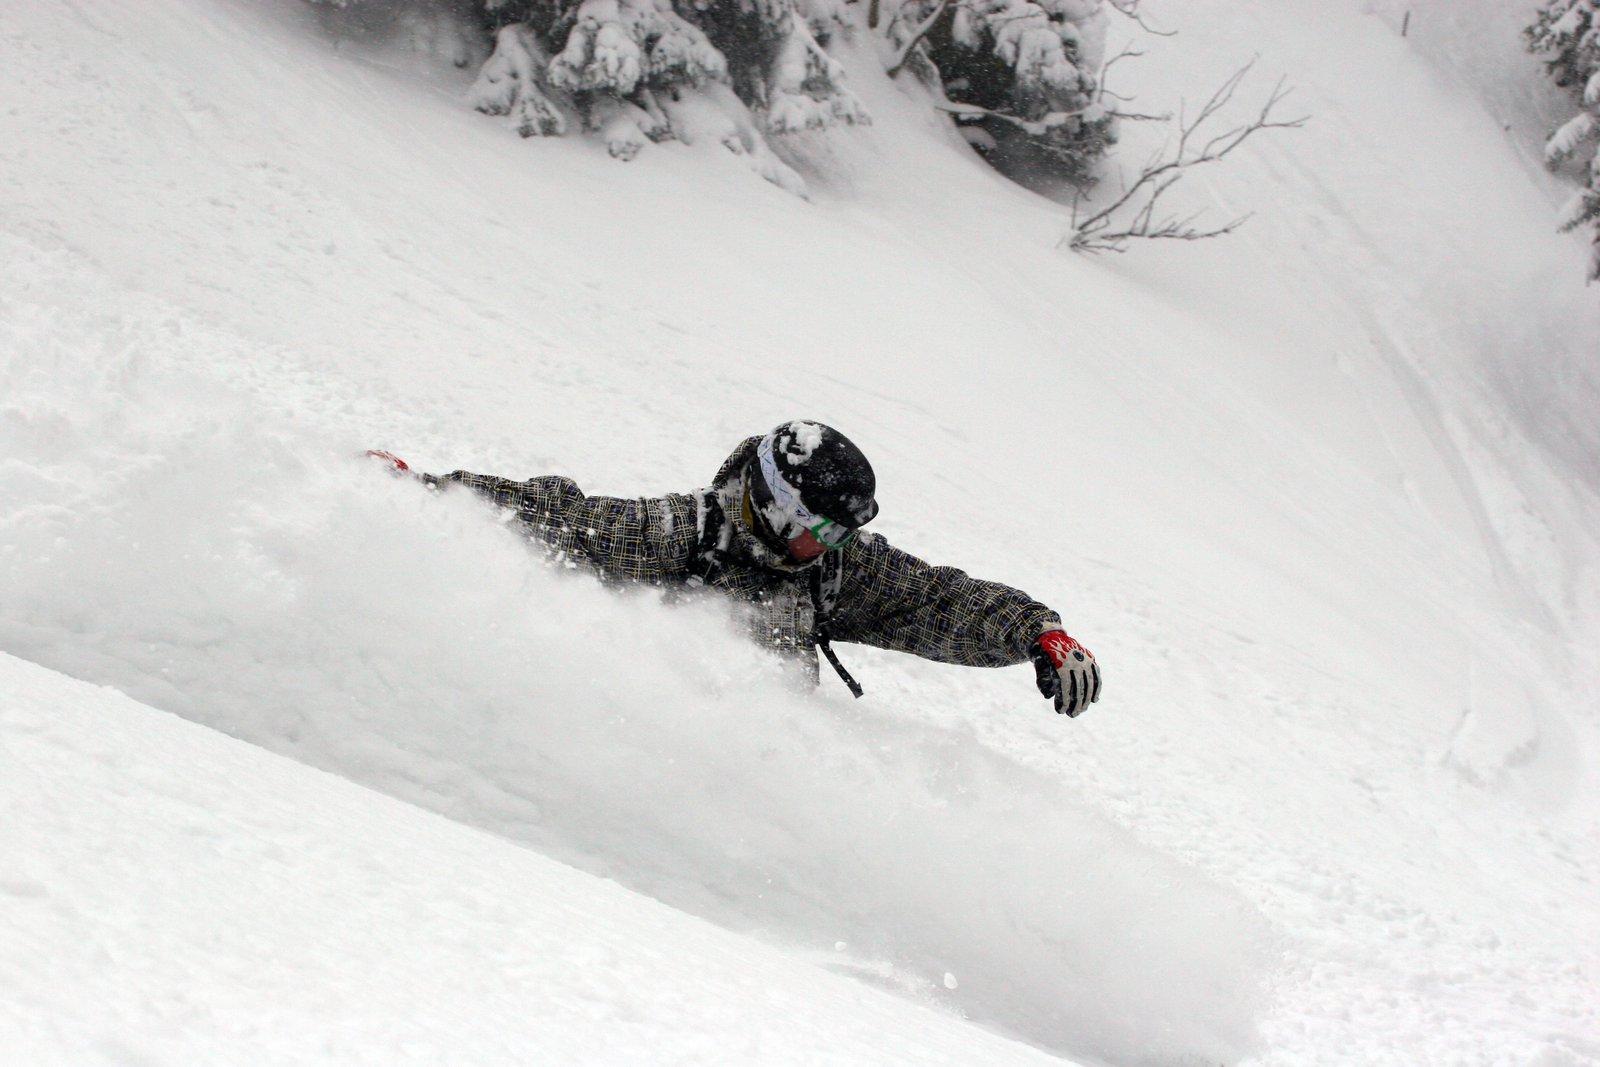 Snowboard turn #3